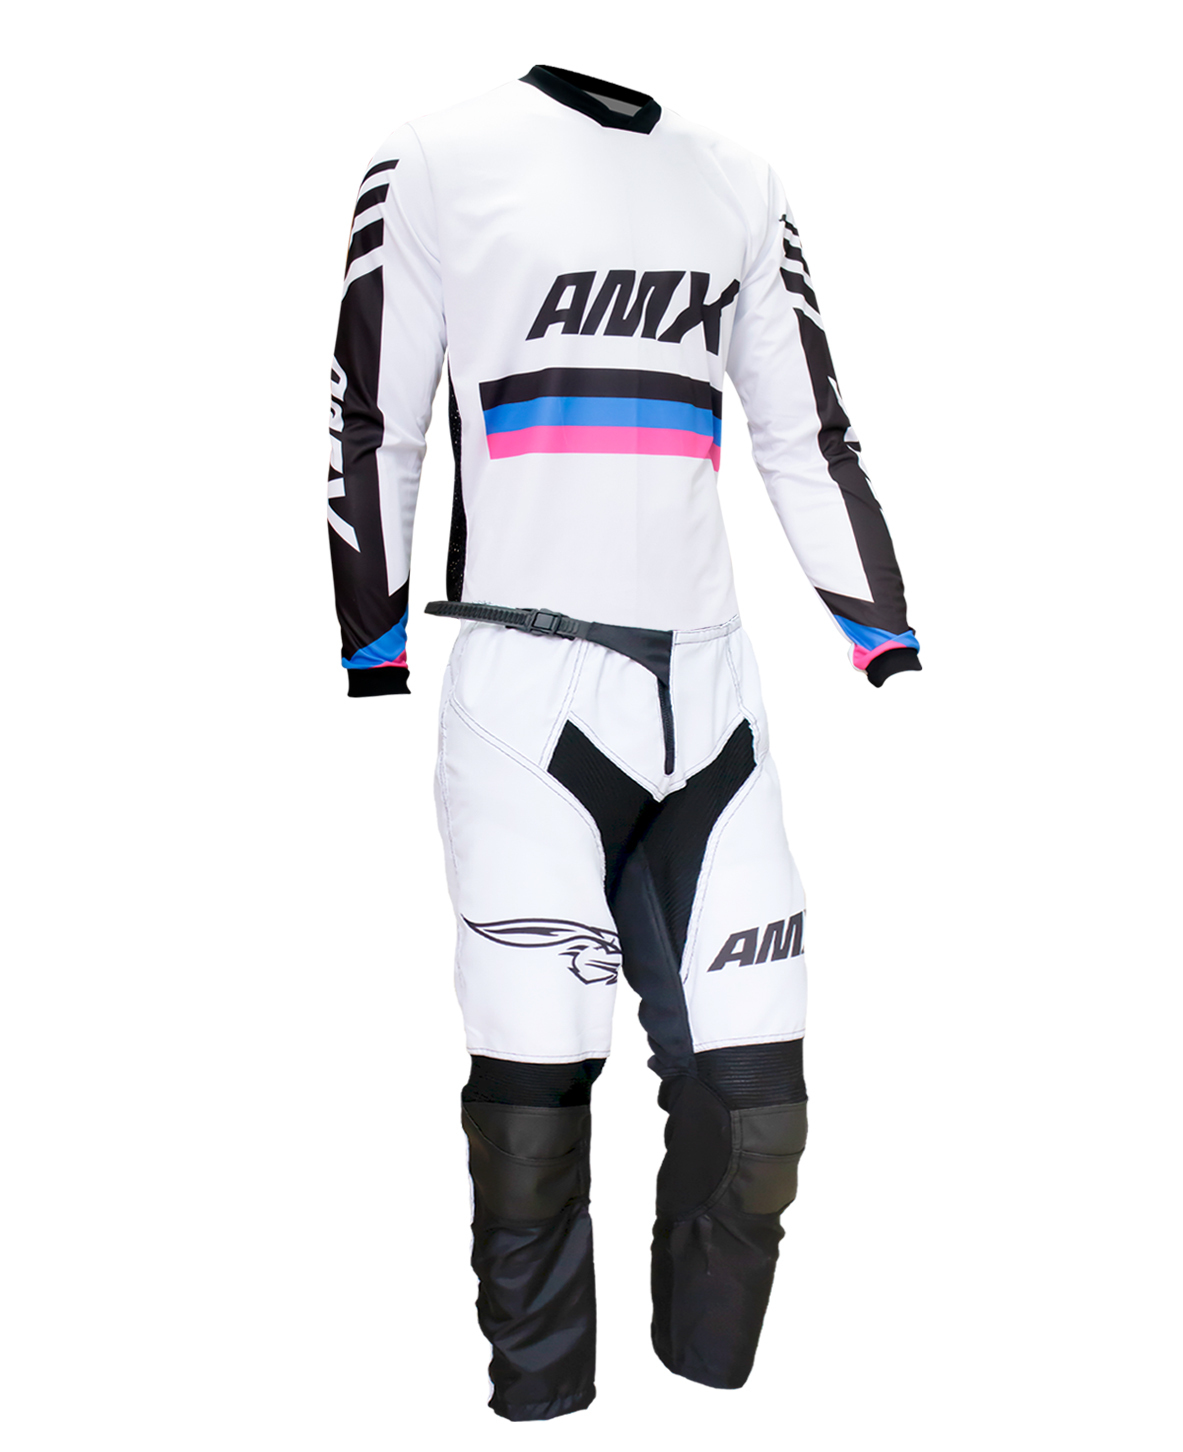 Conjunto Roupa Amx Cross One Branco Calça Camisa Trilha Motocross